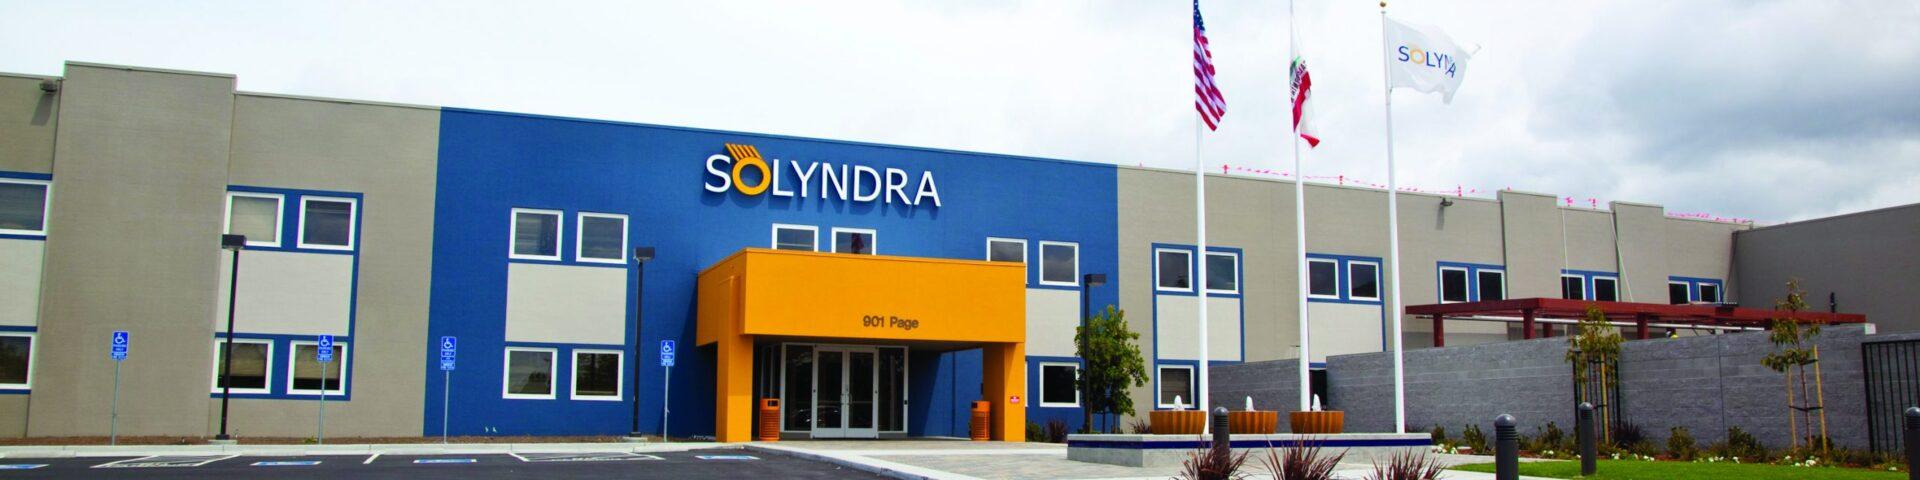 Solyndra Solar Plant